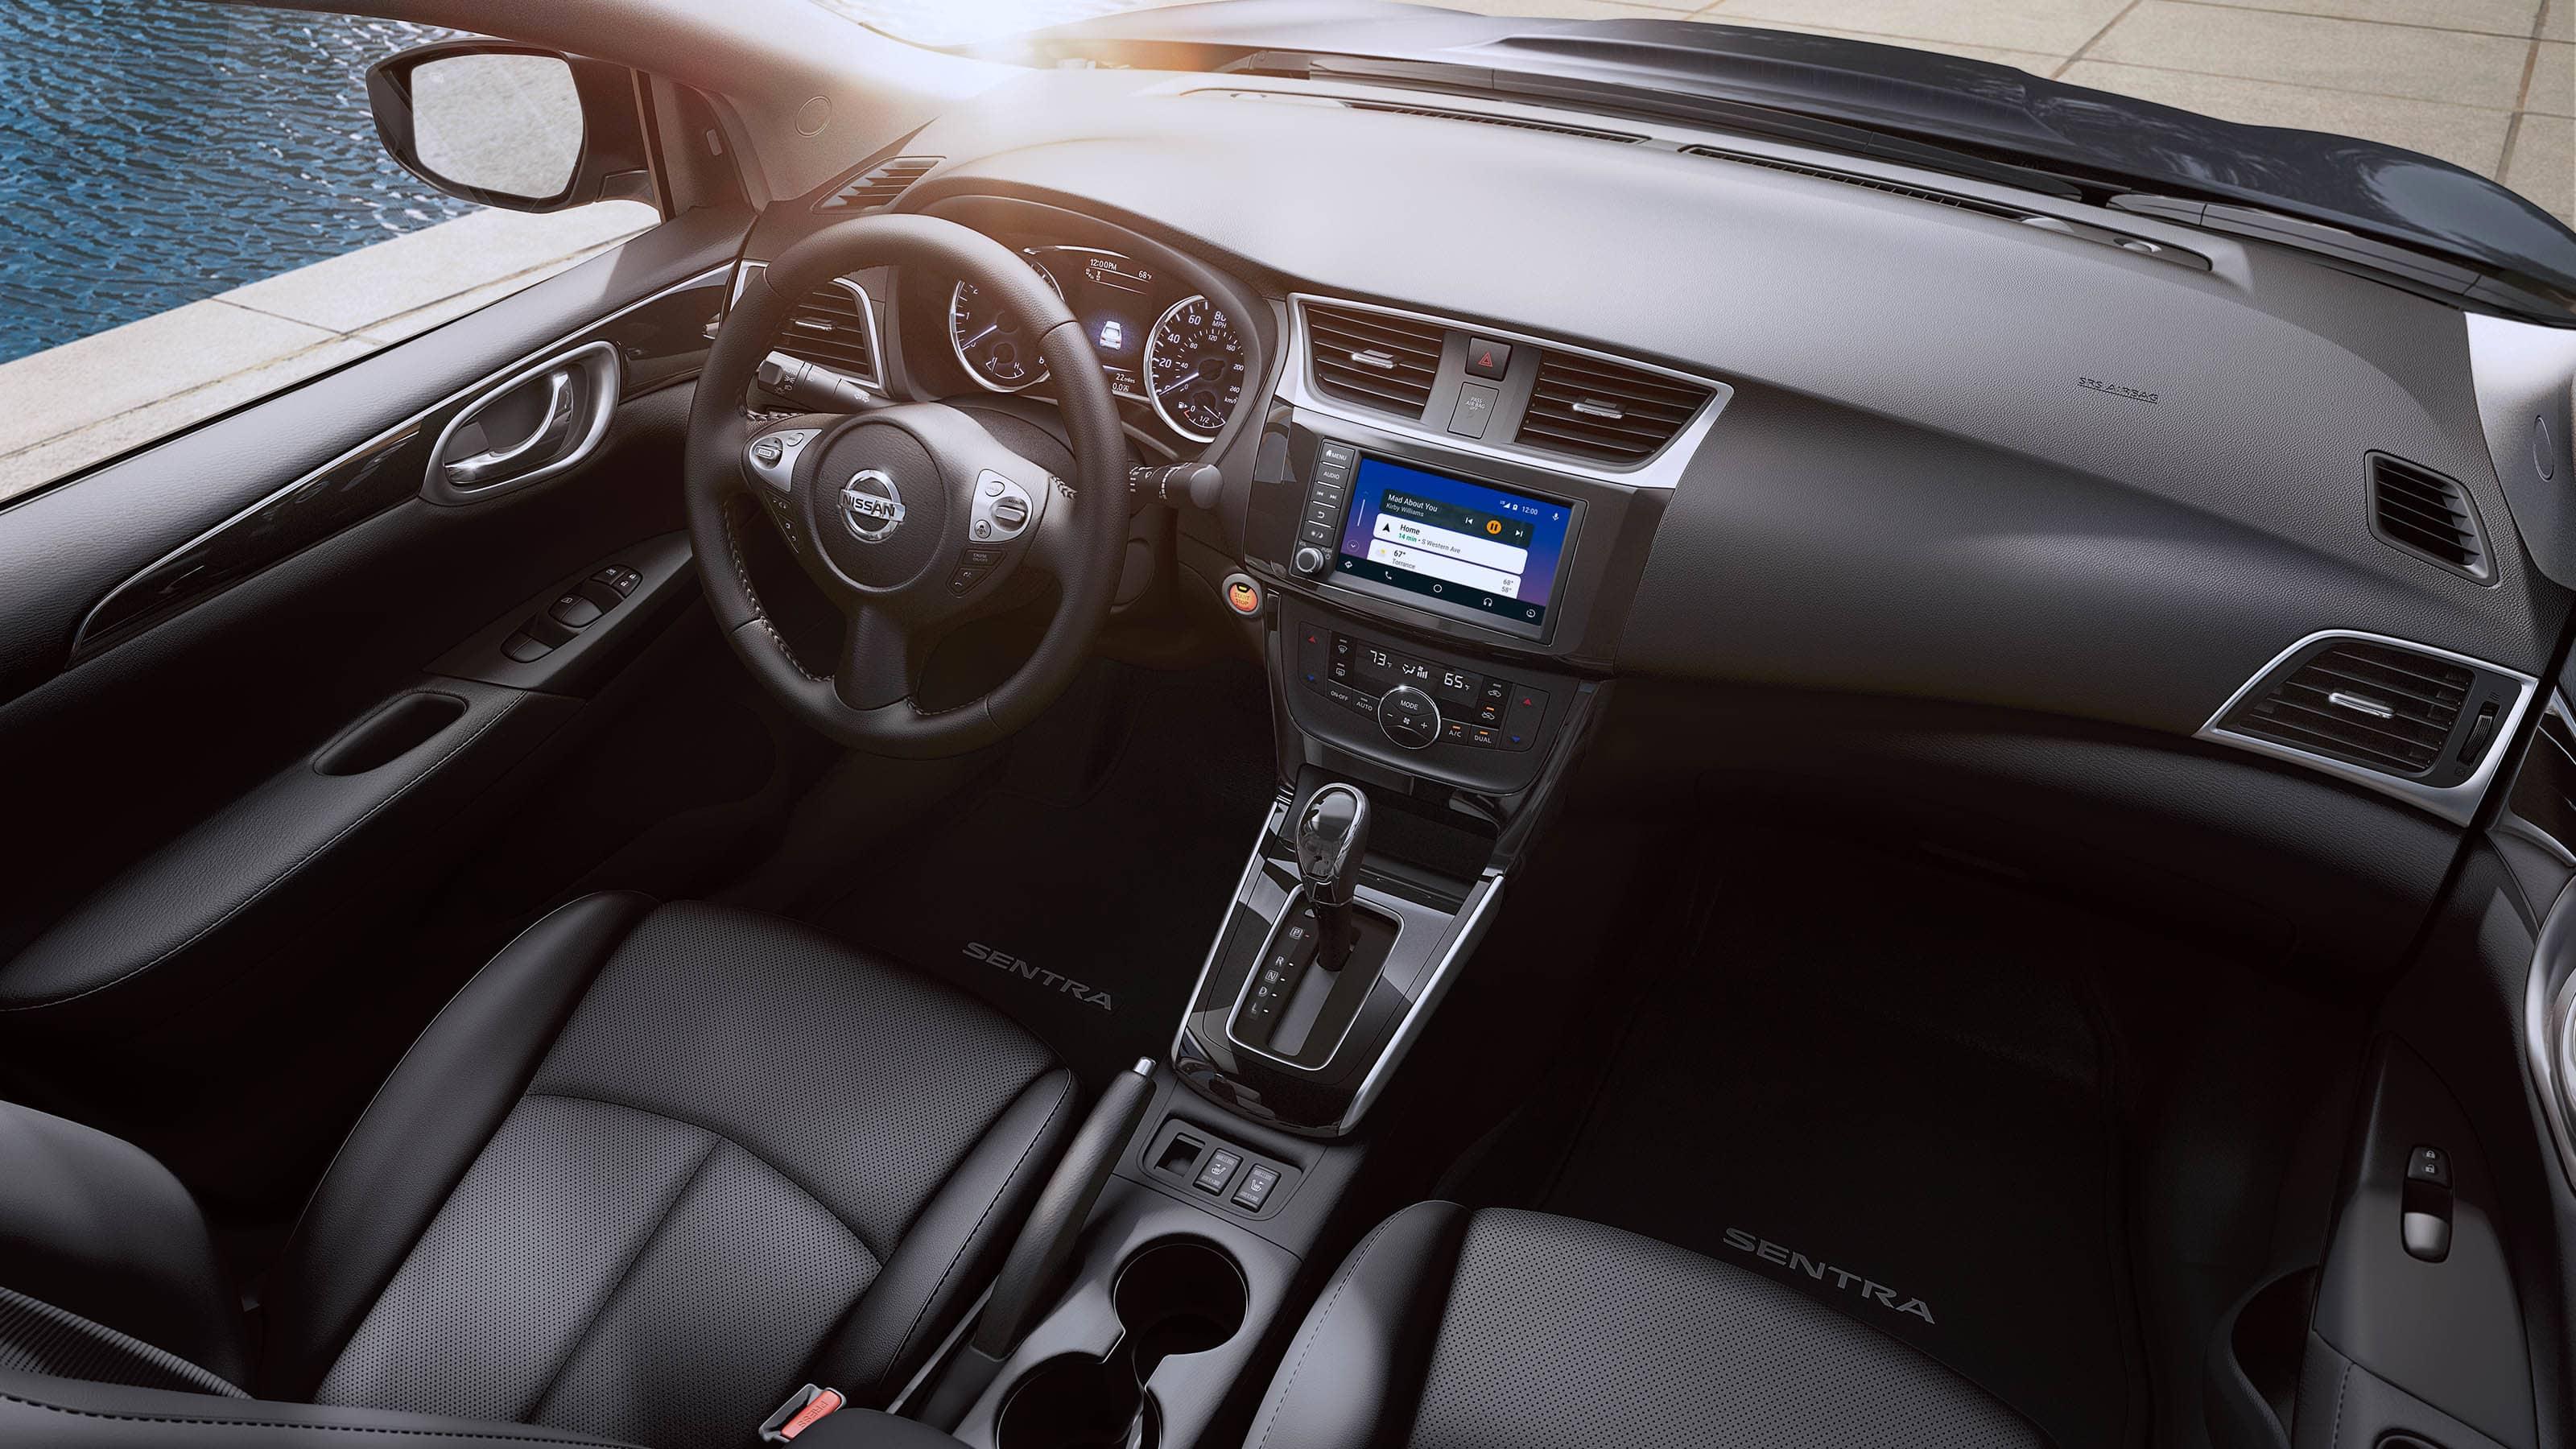 2019 Nissan Sentra Financing near Amityville, NY - Legend ...